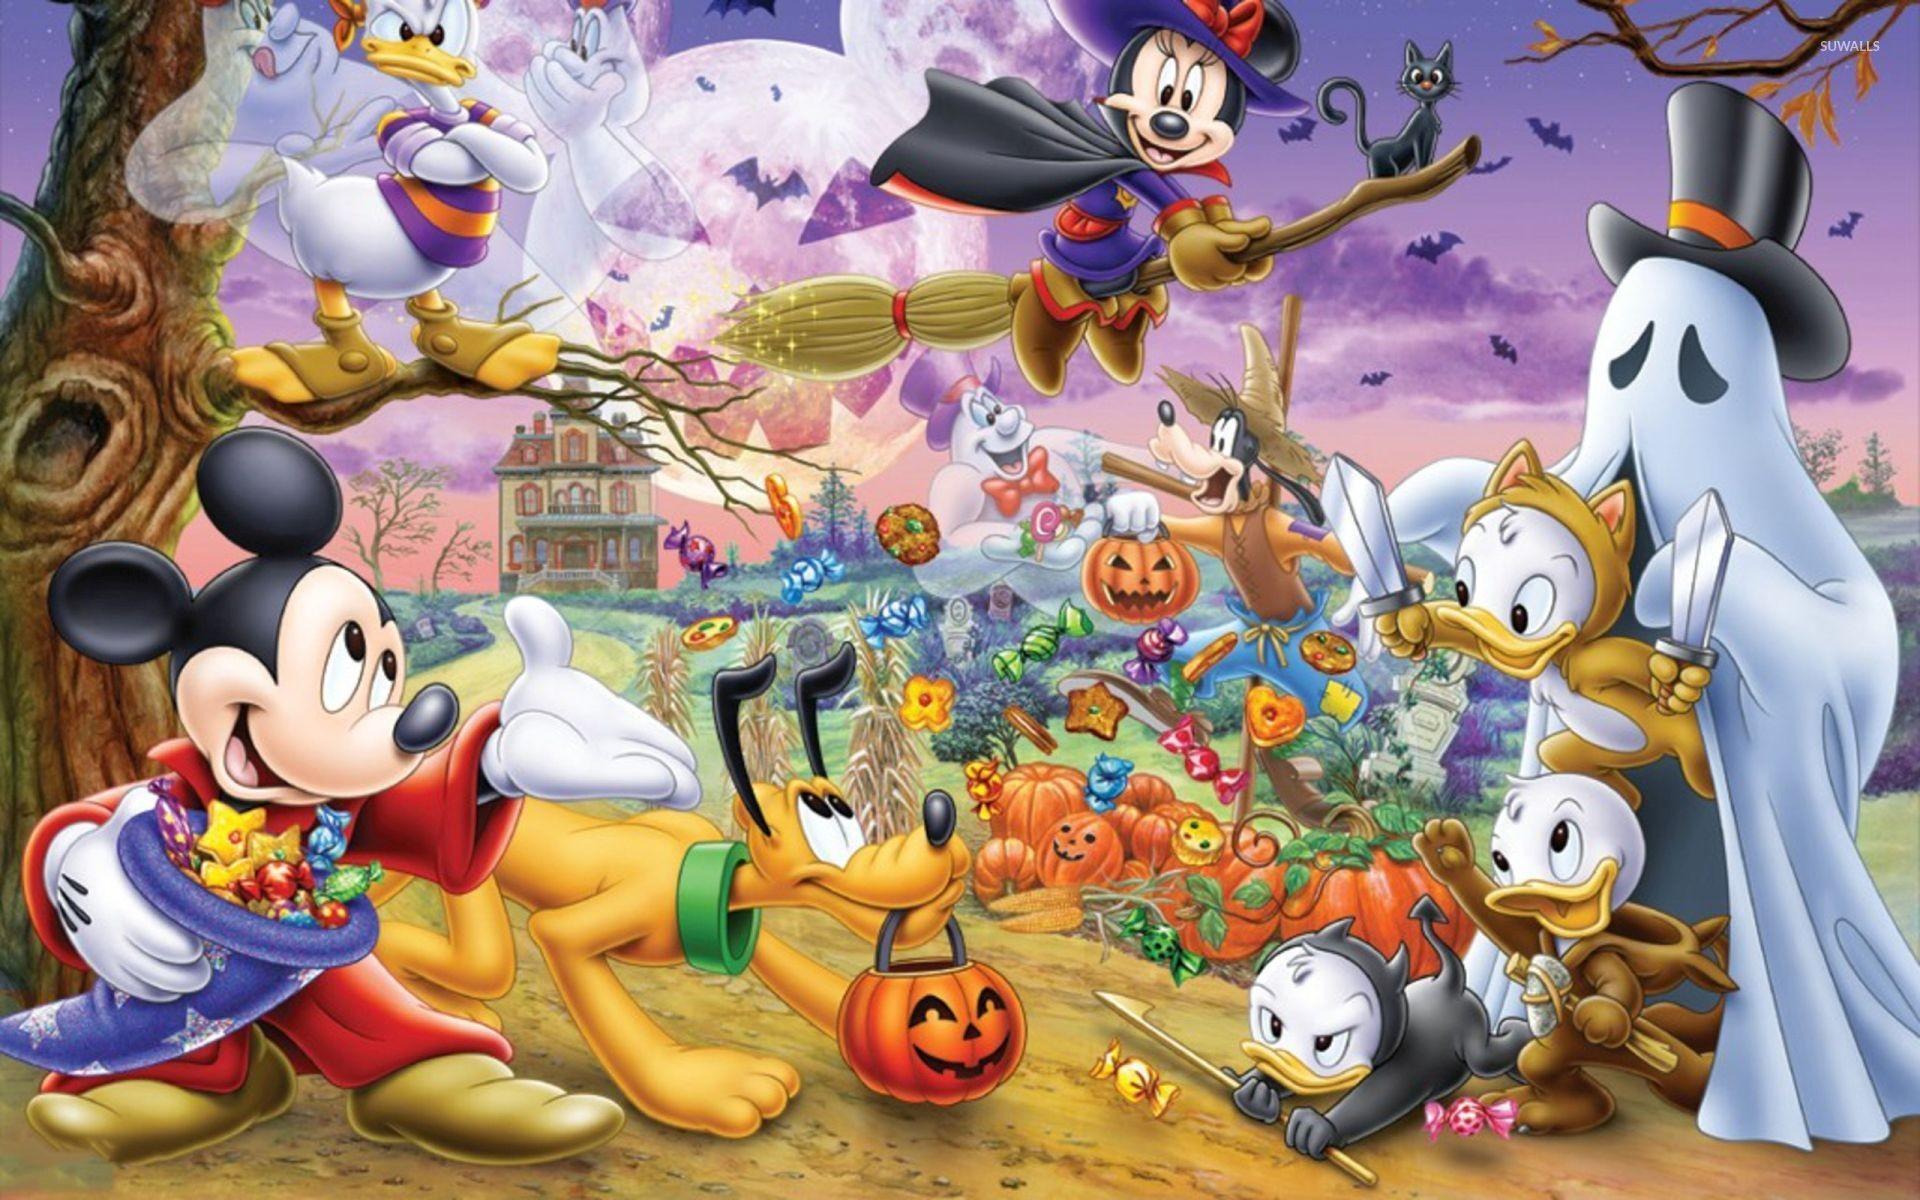 Cute Love Wallpapers Download Hd Disney Halloween Wallpapers 183 ①